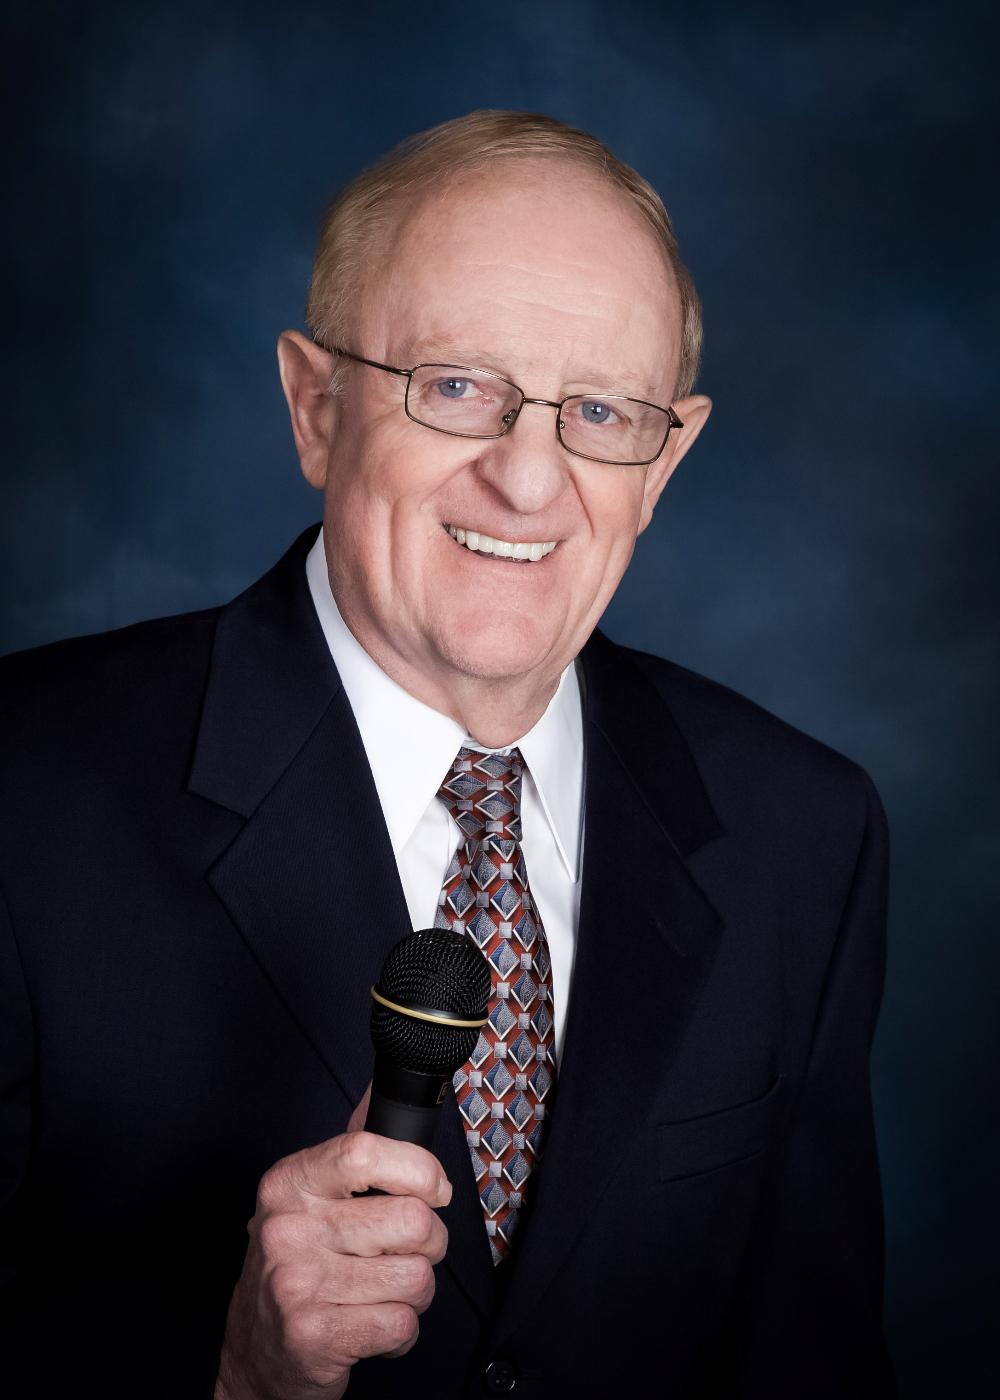 Denny Smith color portrait